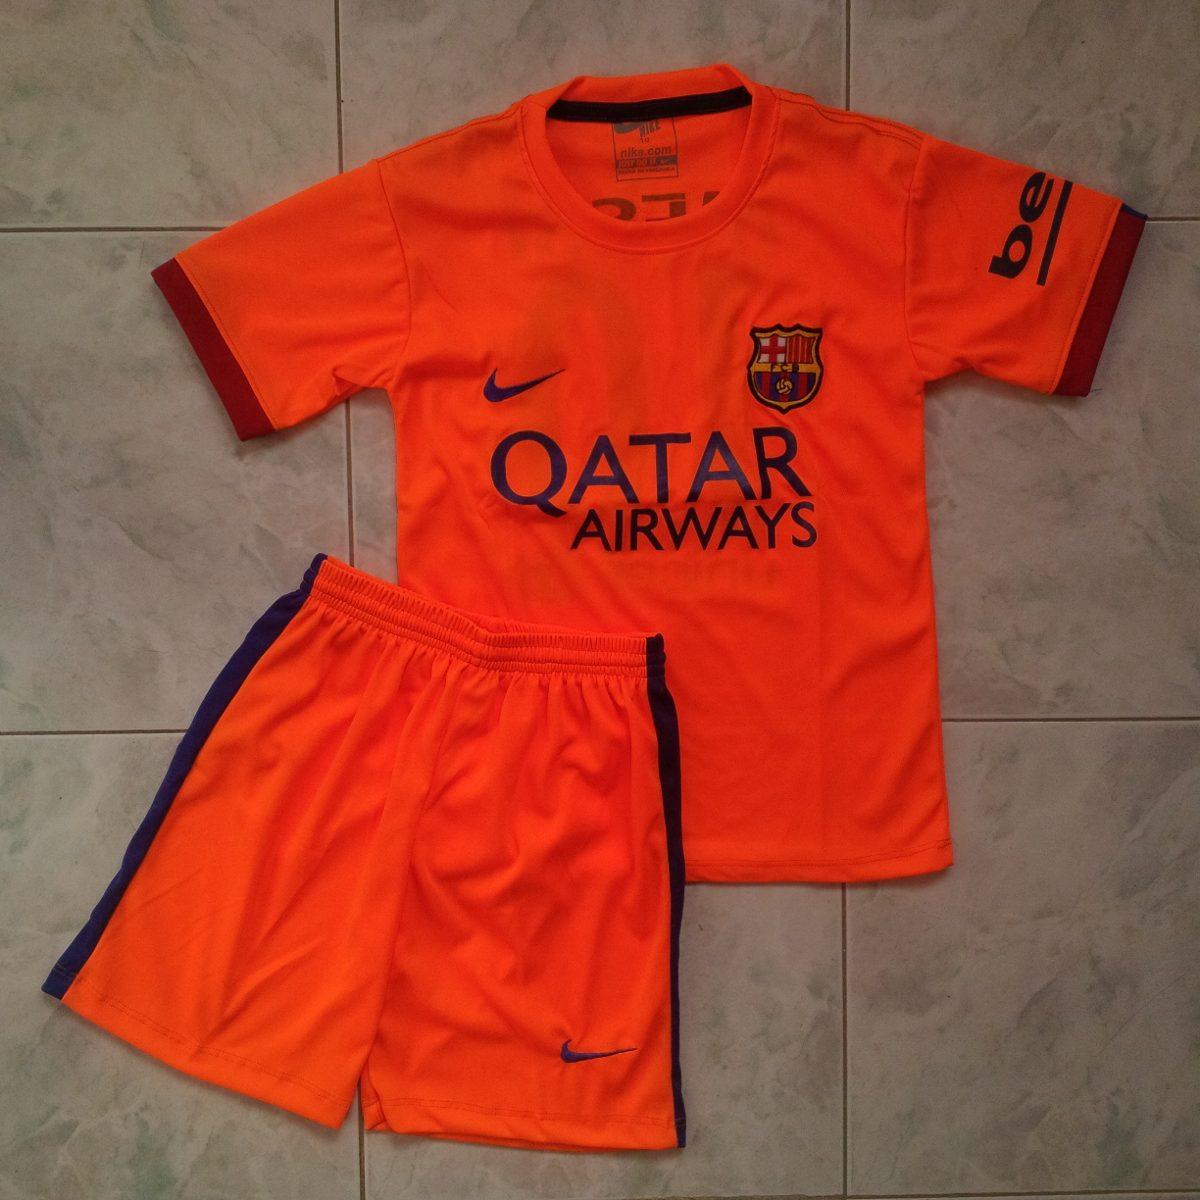 uniforme barcelona fc visitante naranja 2014 2015 niños. Cargando zoom. ffc39ce6963